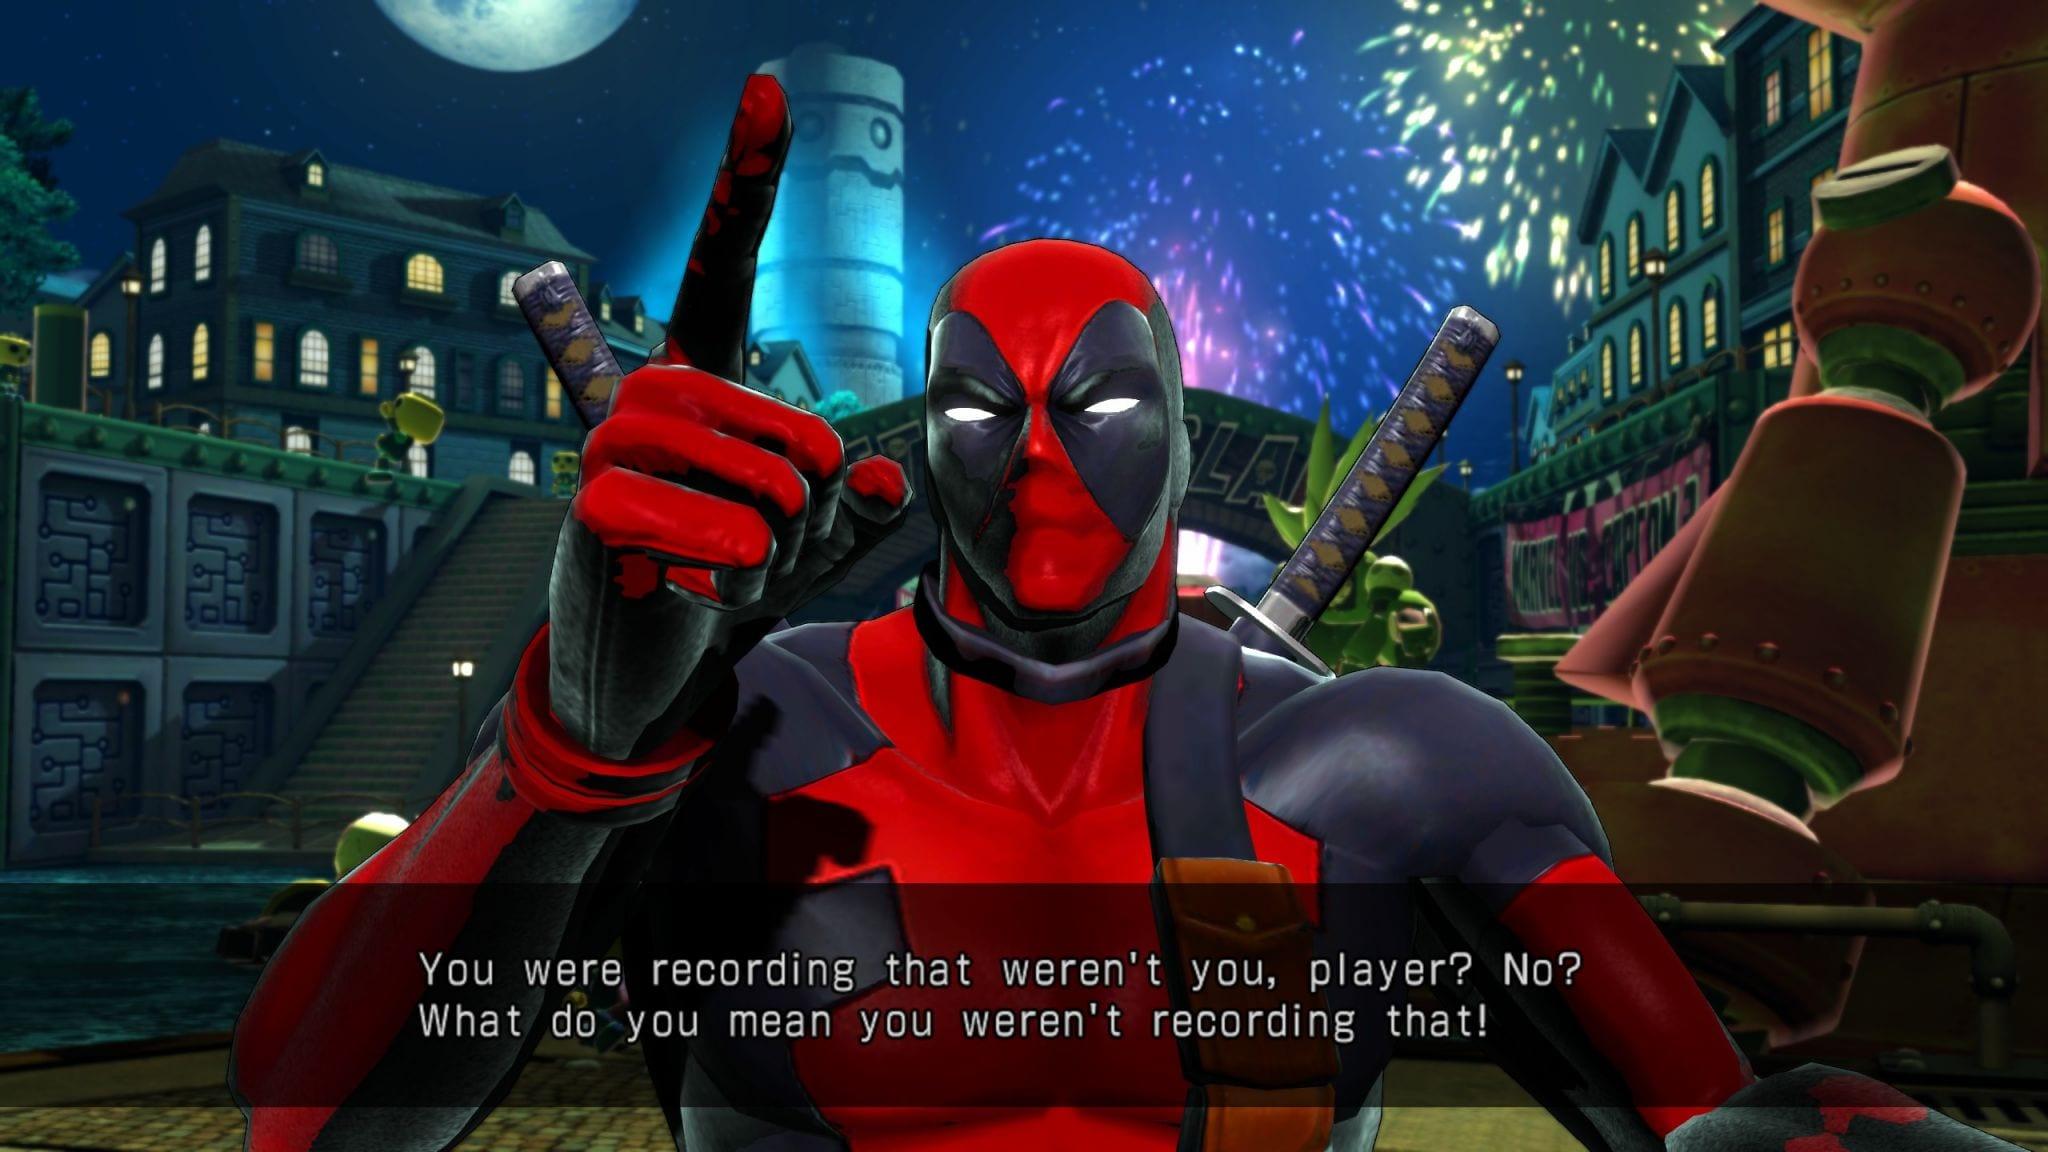 Ultimate Marvel Vs Capcom 3 PC Technical Review PC Invasion